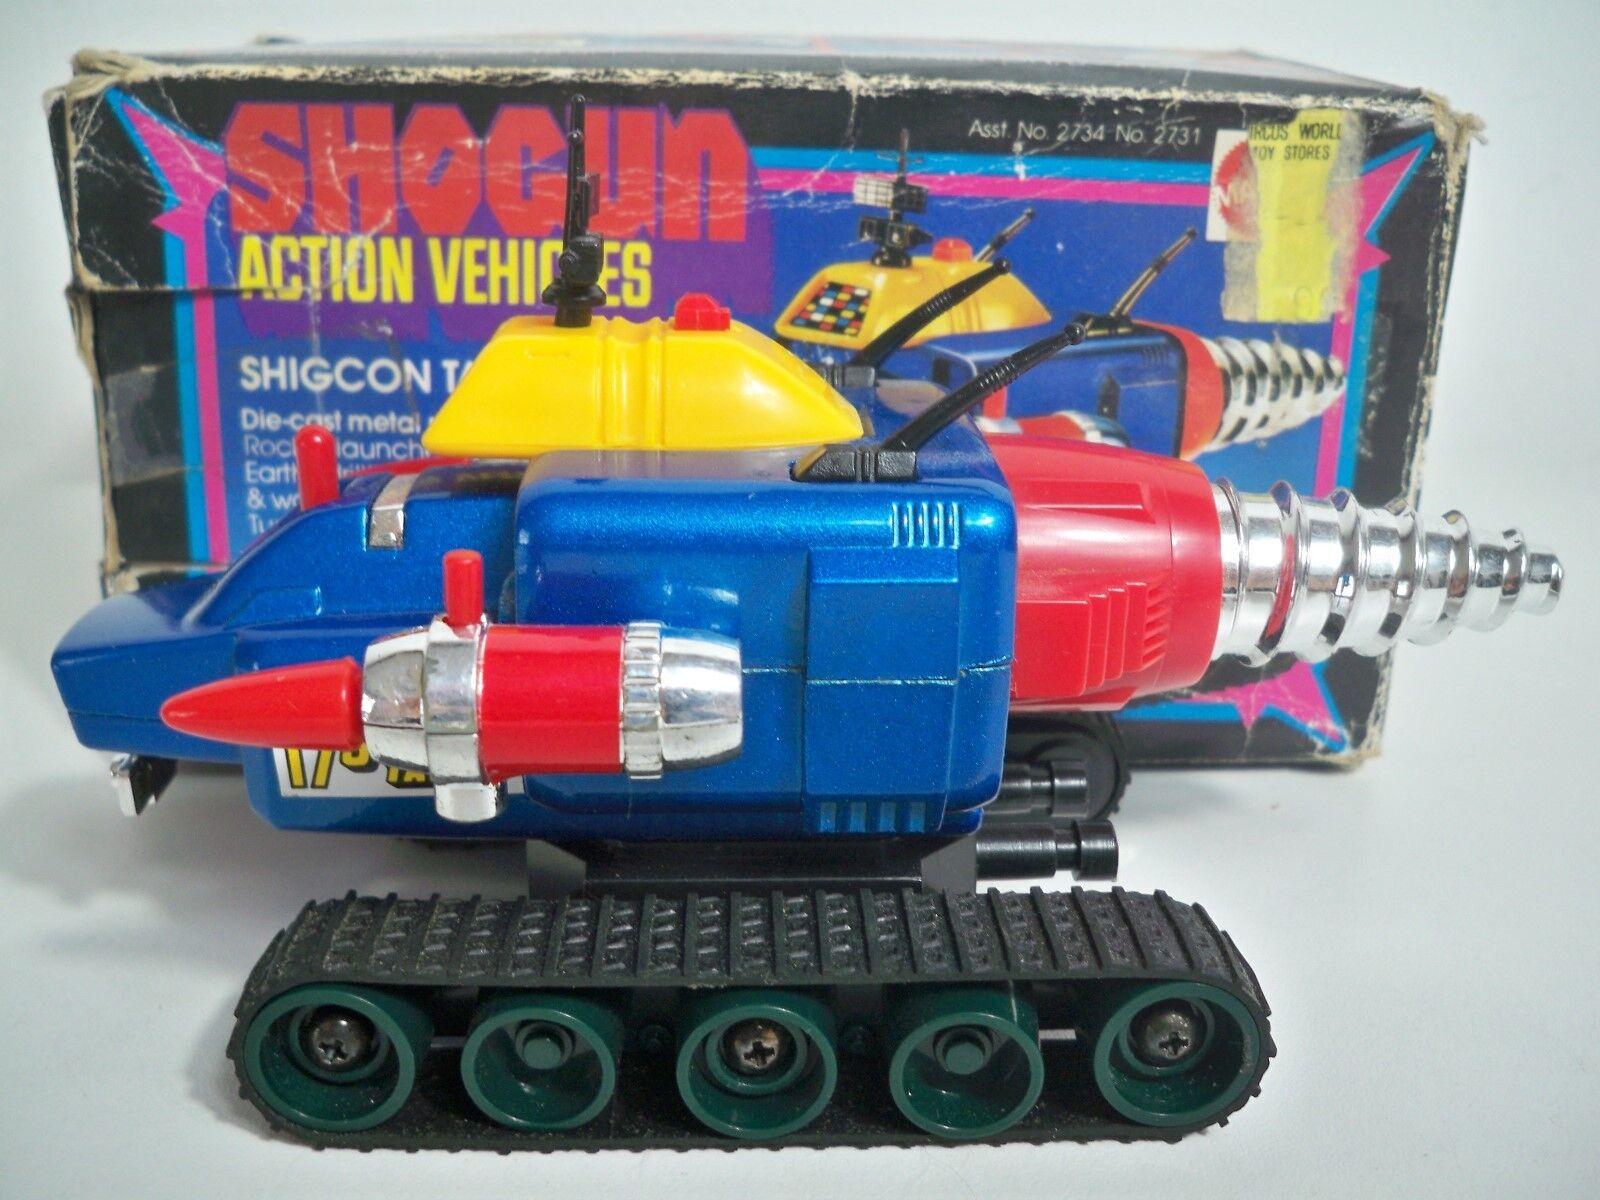 K187546 SHIGCON TANK W/ BOX SHOGUN WARRIORS 1978 DIECAST METAL 100% COMPLETE